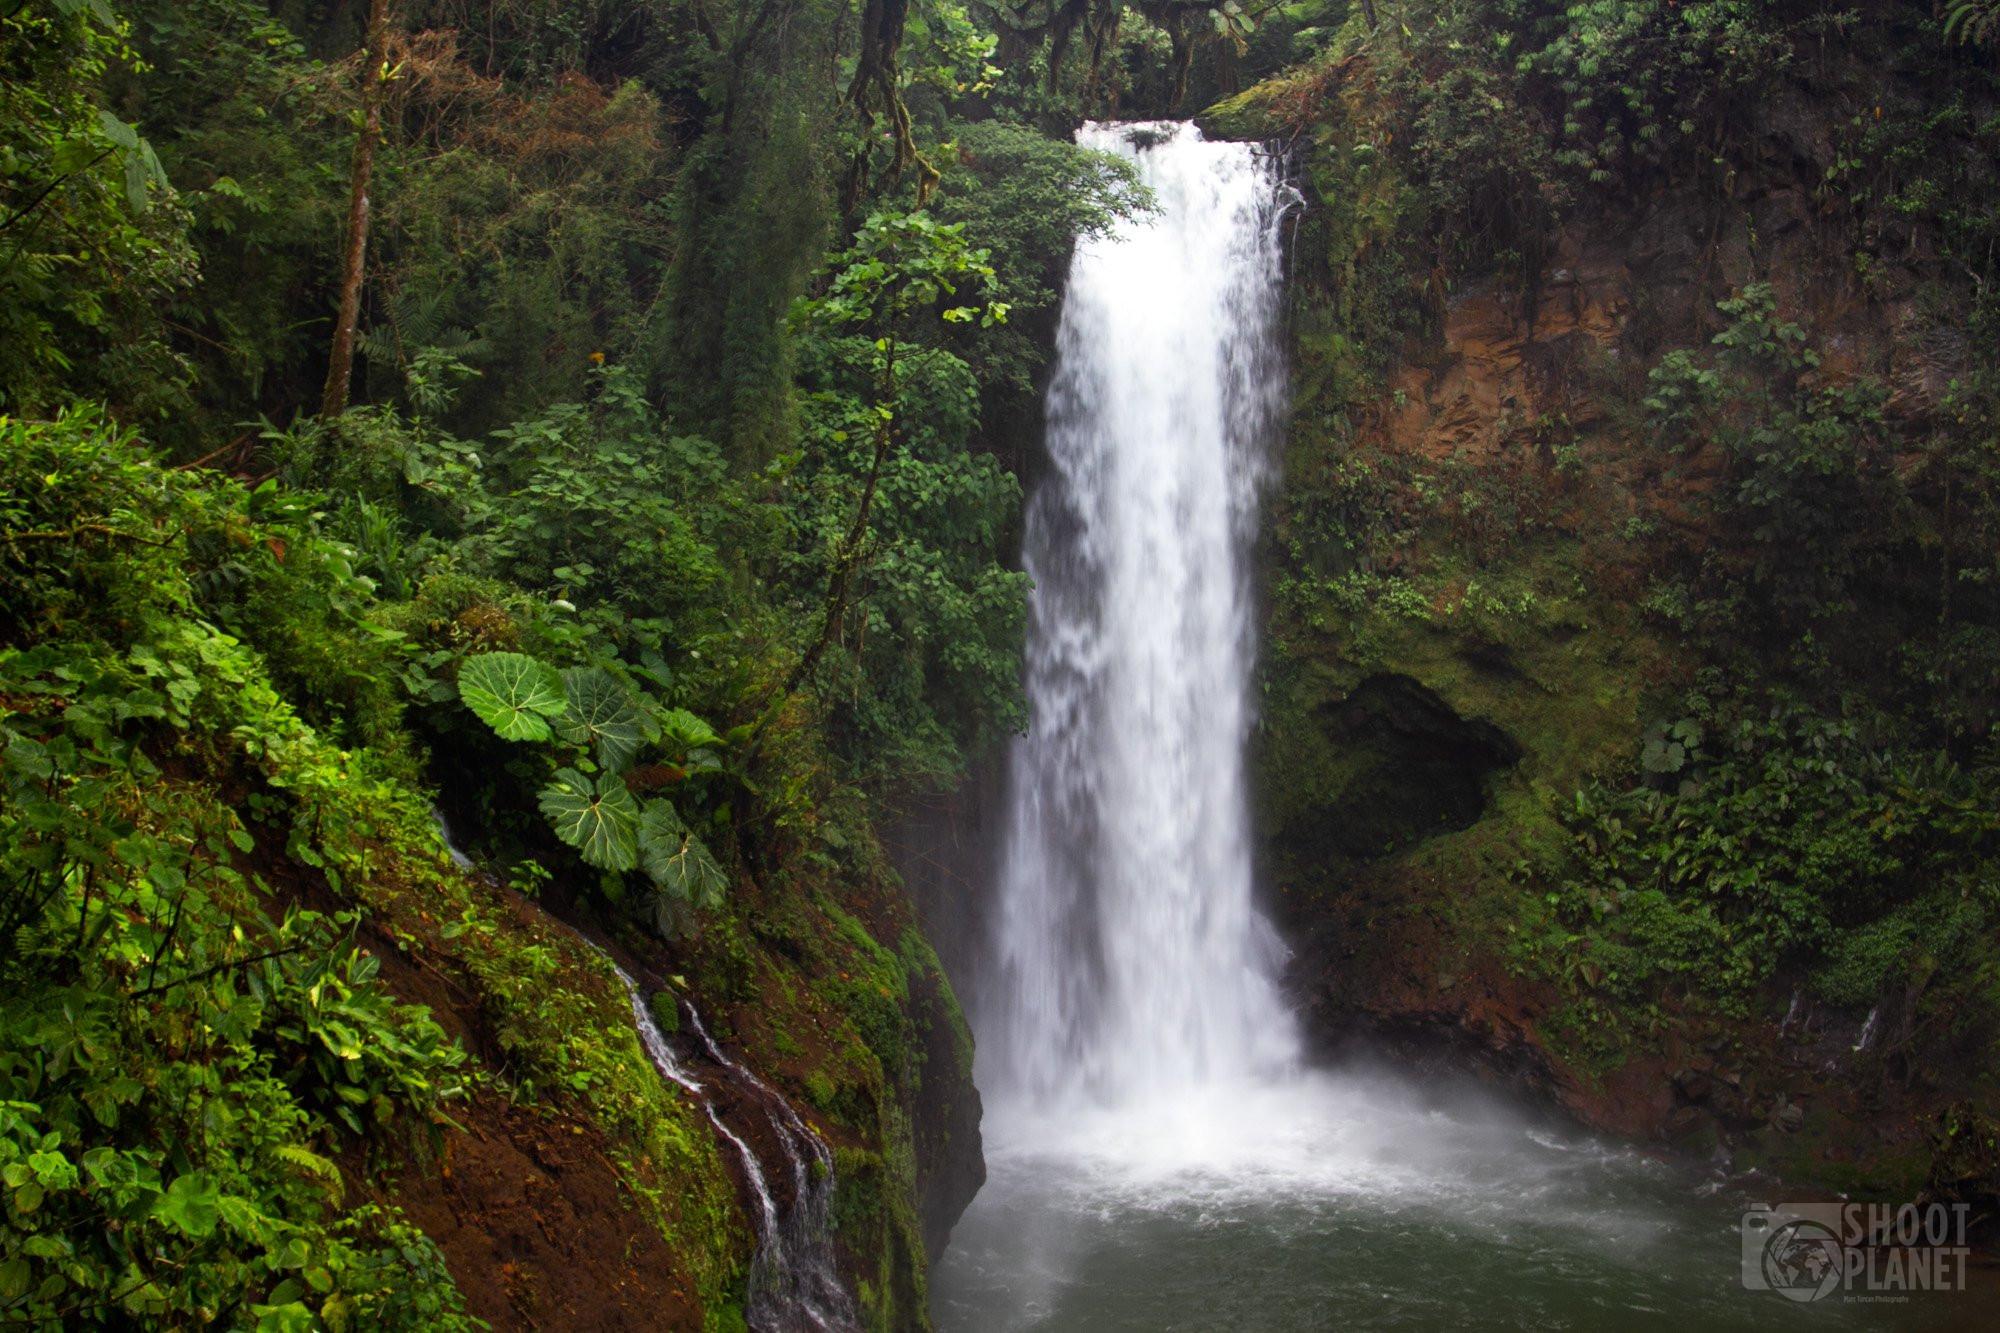 La Paz waterfall, Costa Rica Central Valley